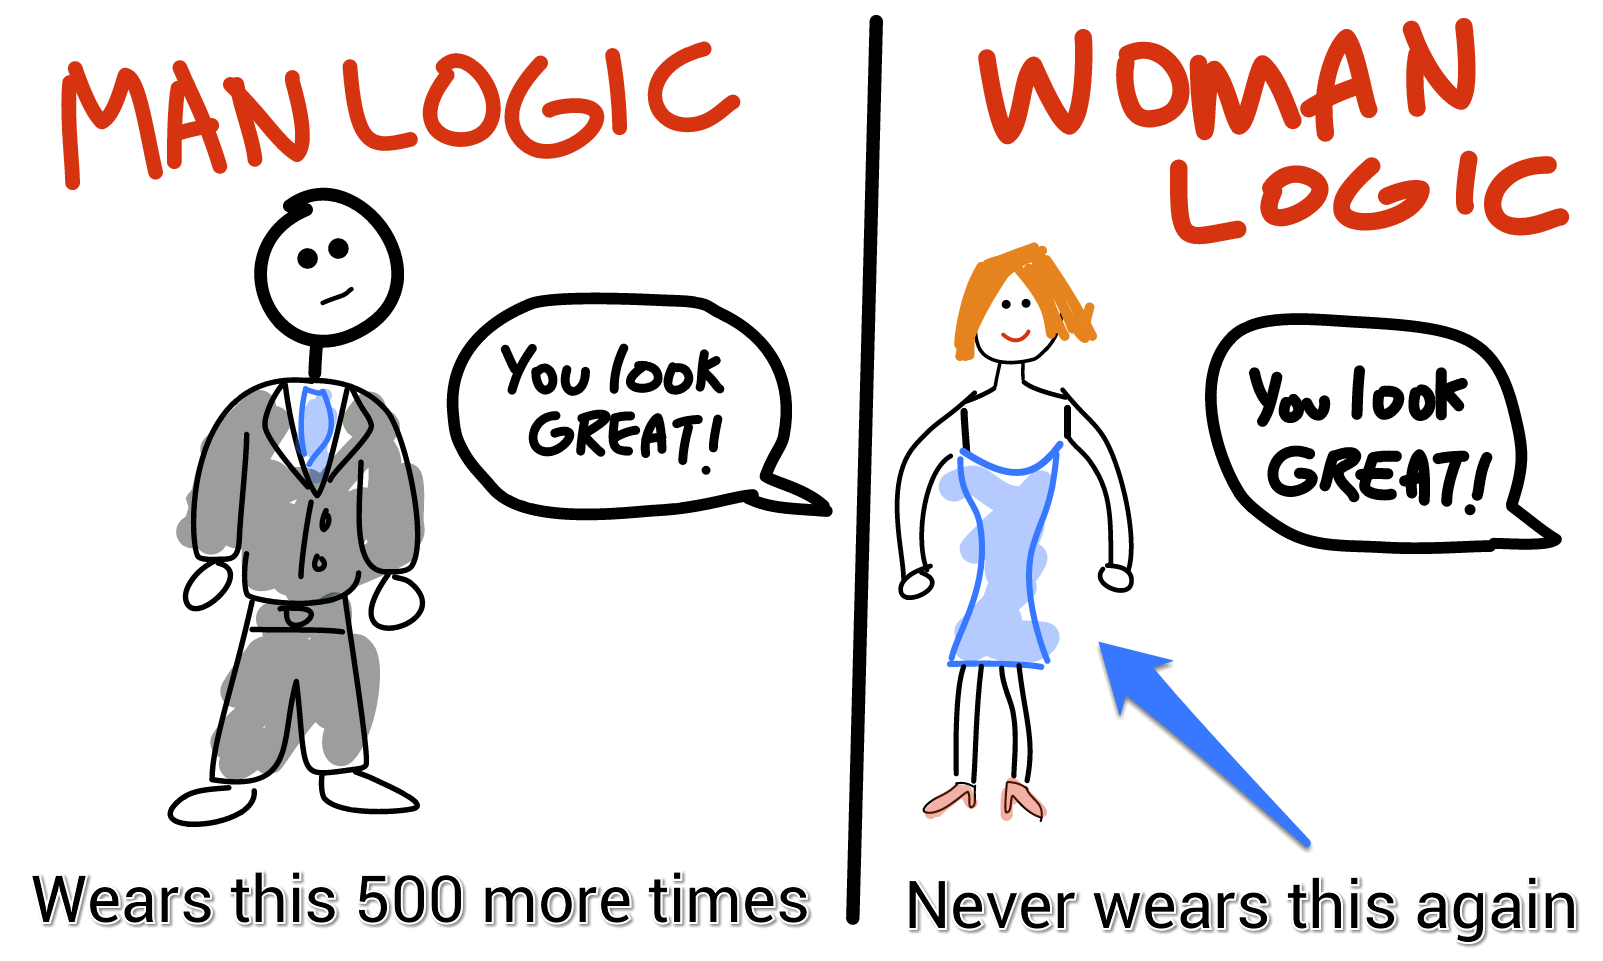 Man Logic vs Woman Logic